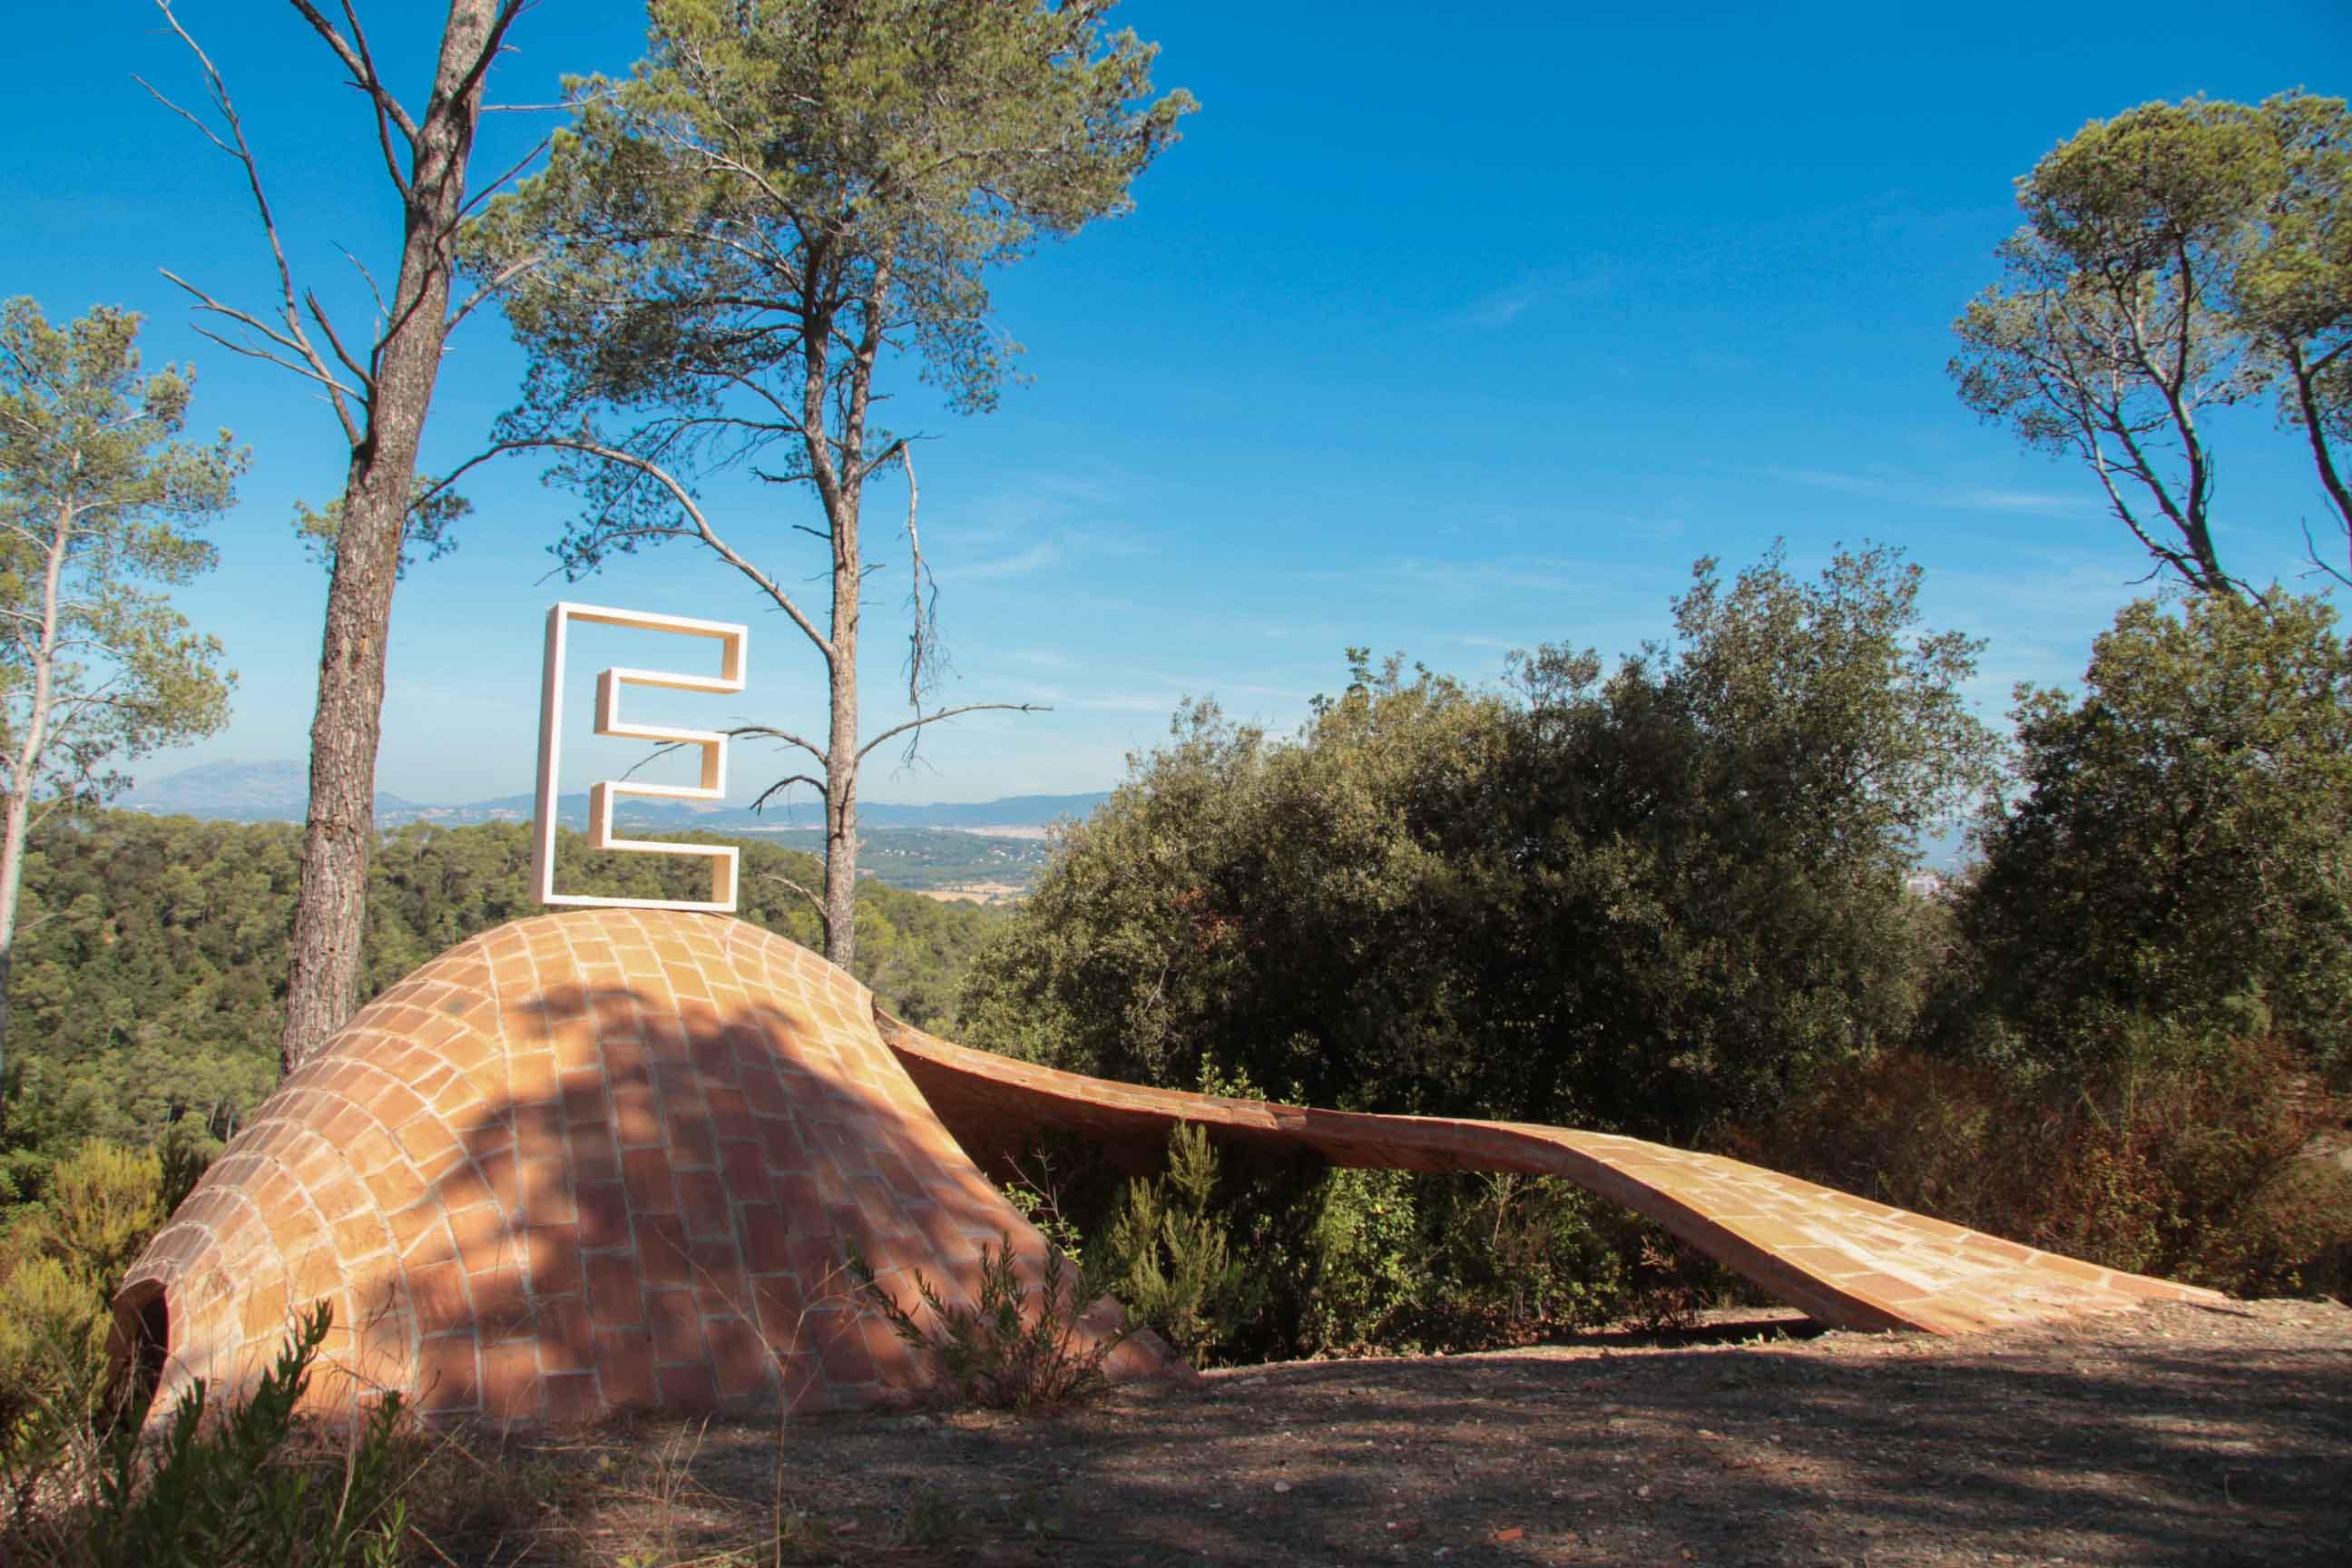 the valldaura experience-ms-balloon-iaac-lo-siento-design-hand-made-wood-work-barcelona_-16